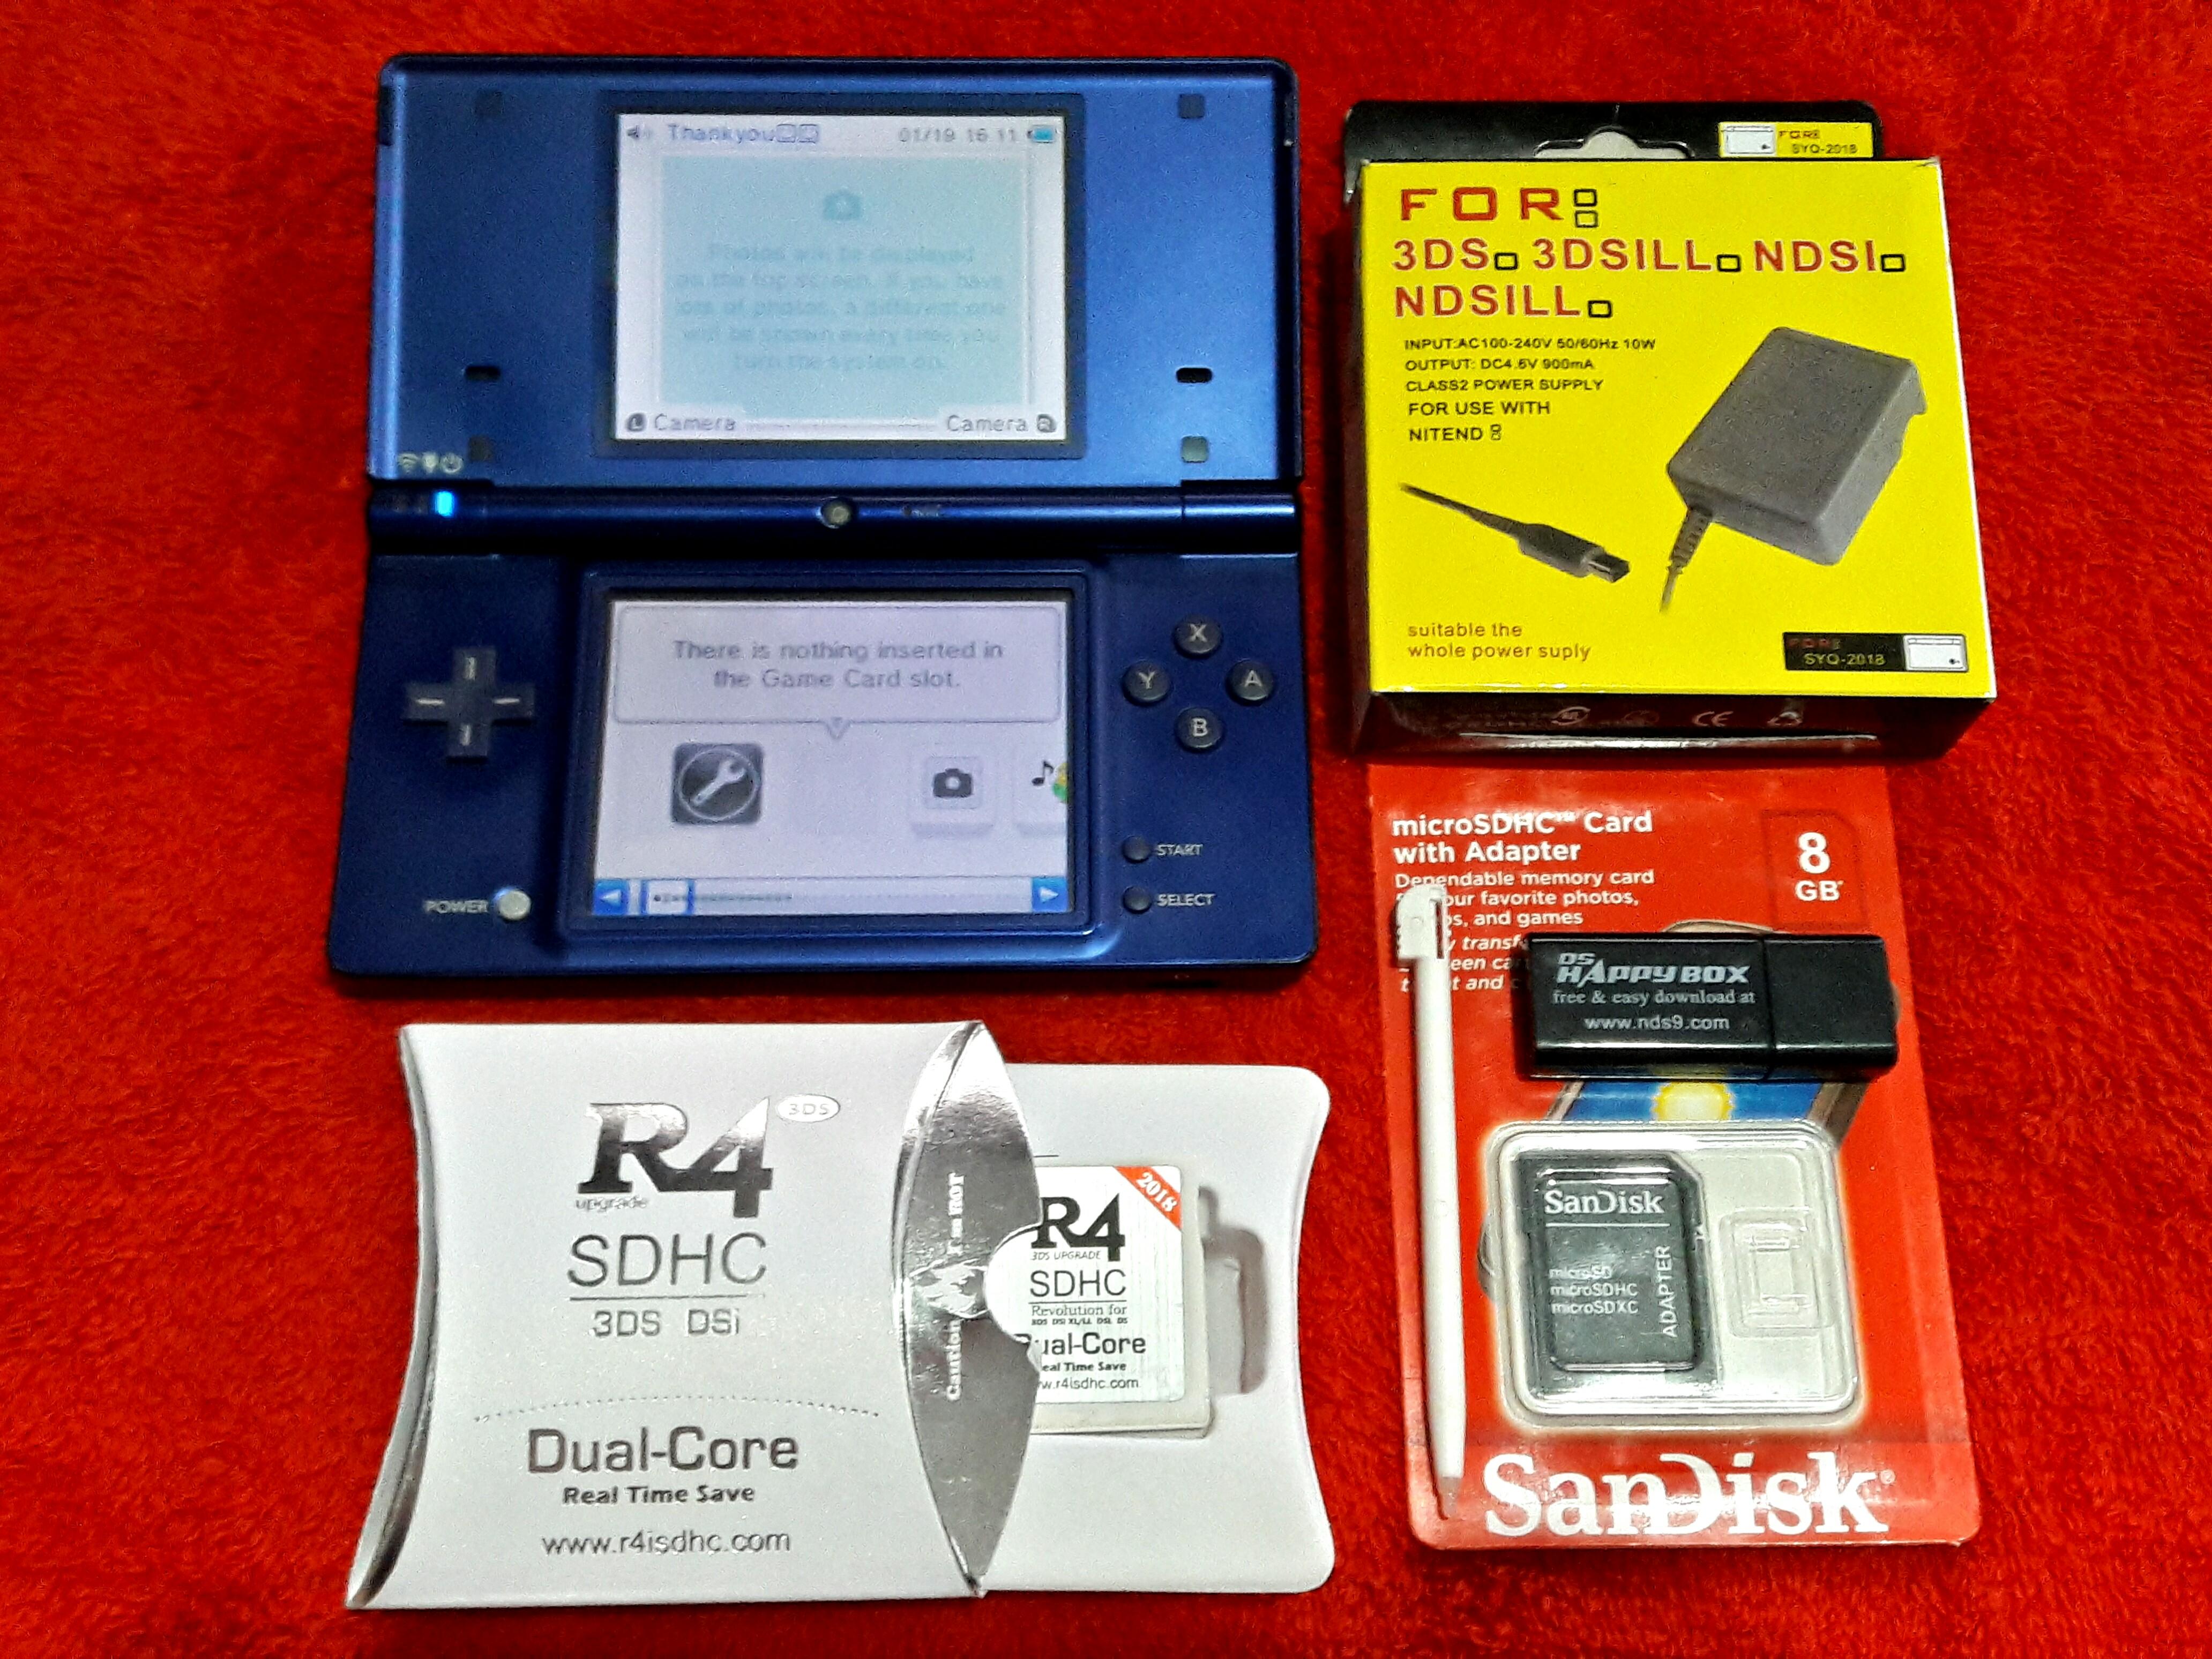 105 Games Blue Nintendo Dsi R4 8gb